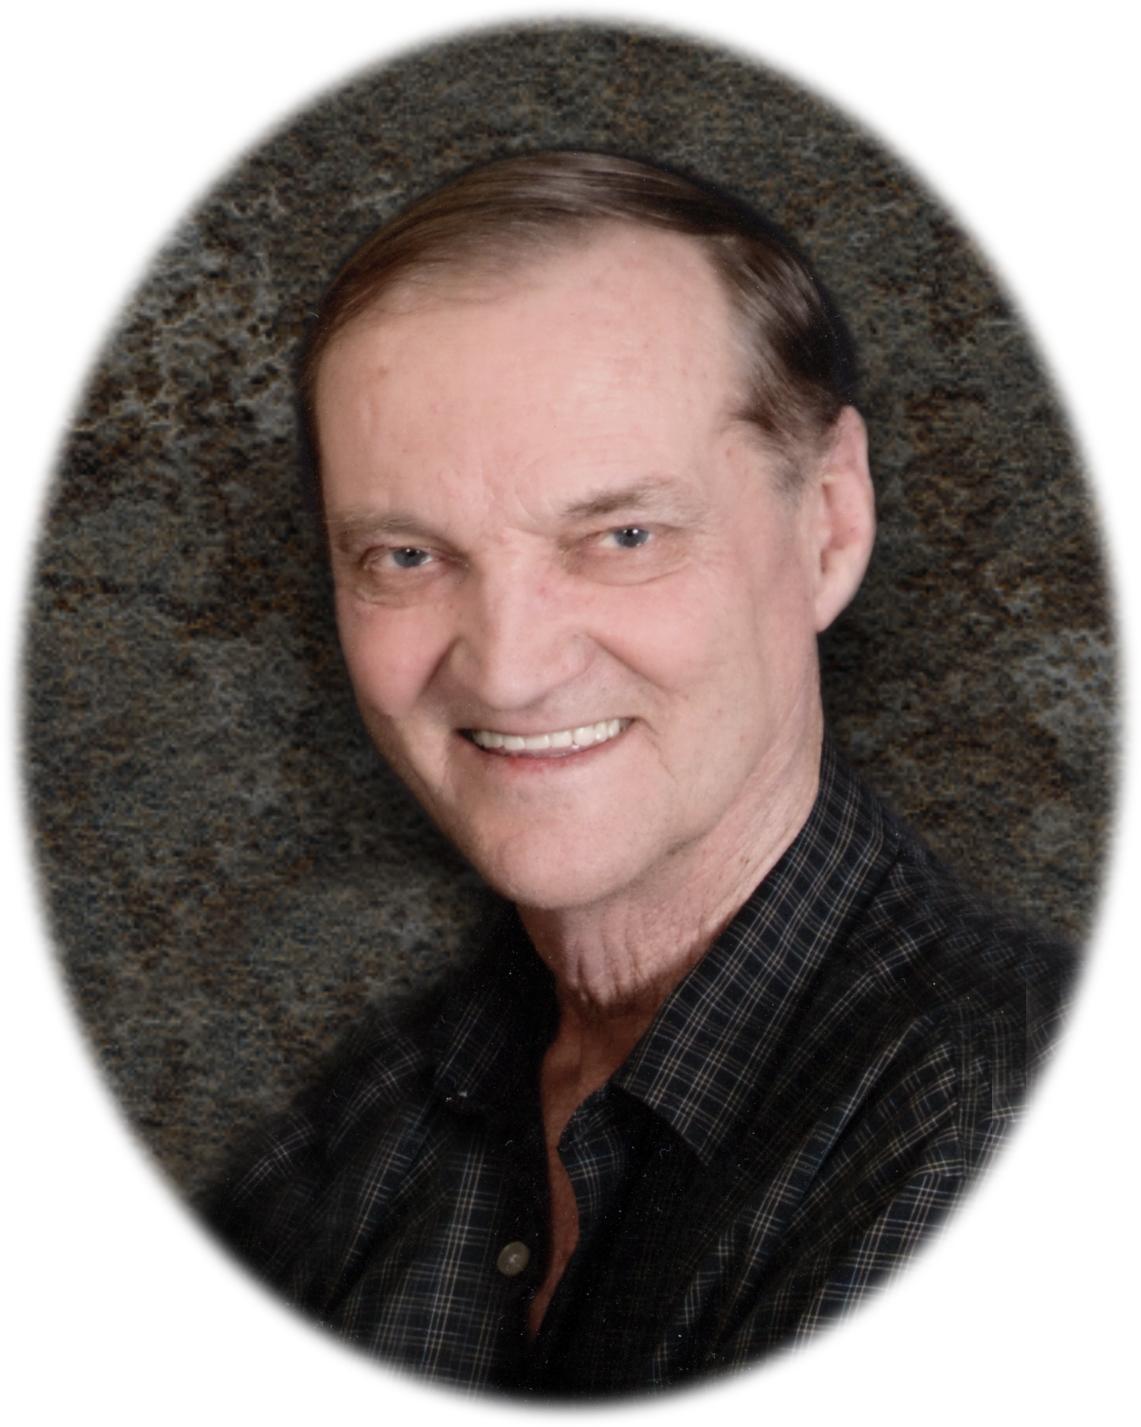 Daniel F. A. Legband